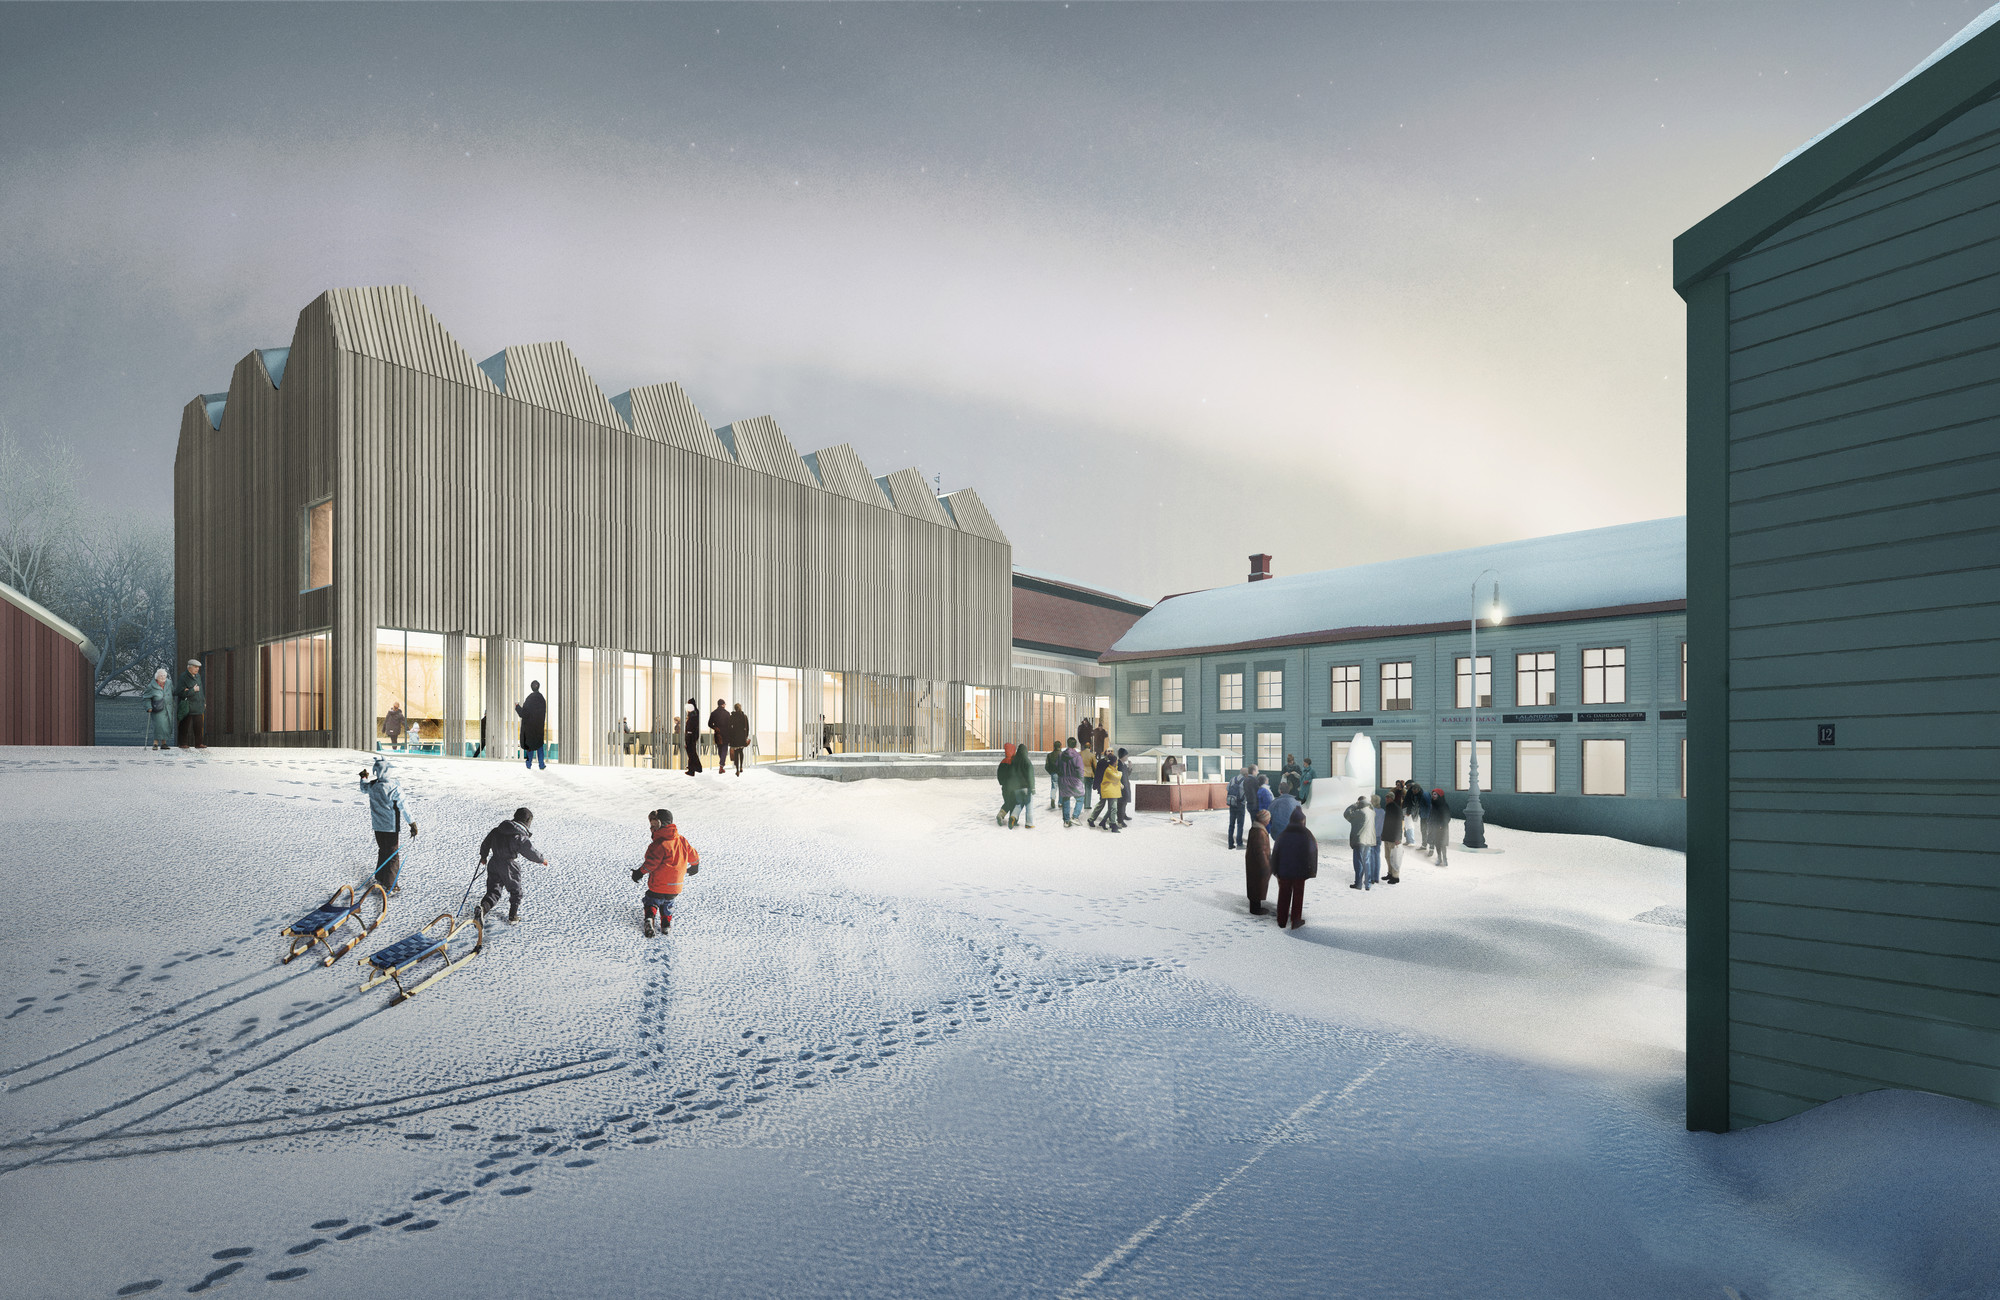 Henning Larsen Designs New Branch of Swedish National Museum, Courtyard. Image © Henning Larsen Architects